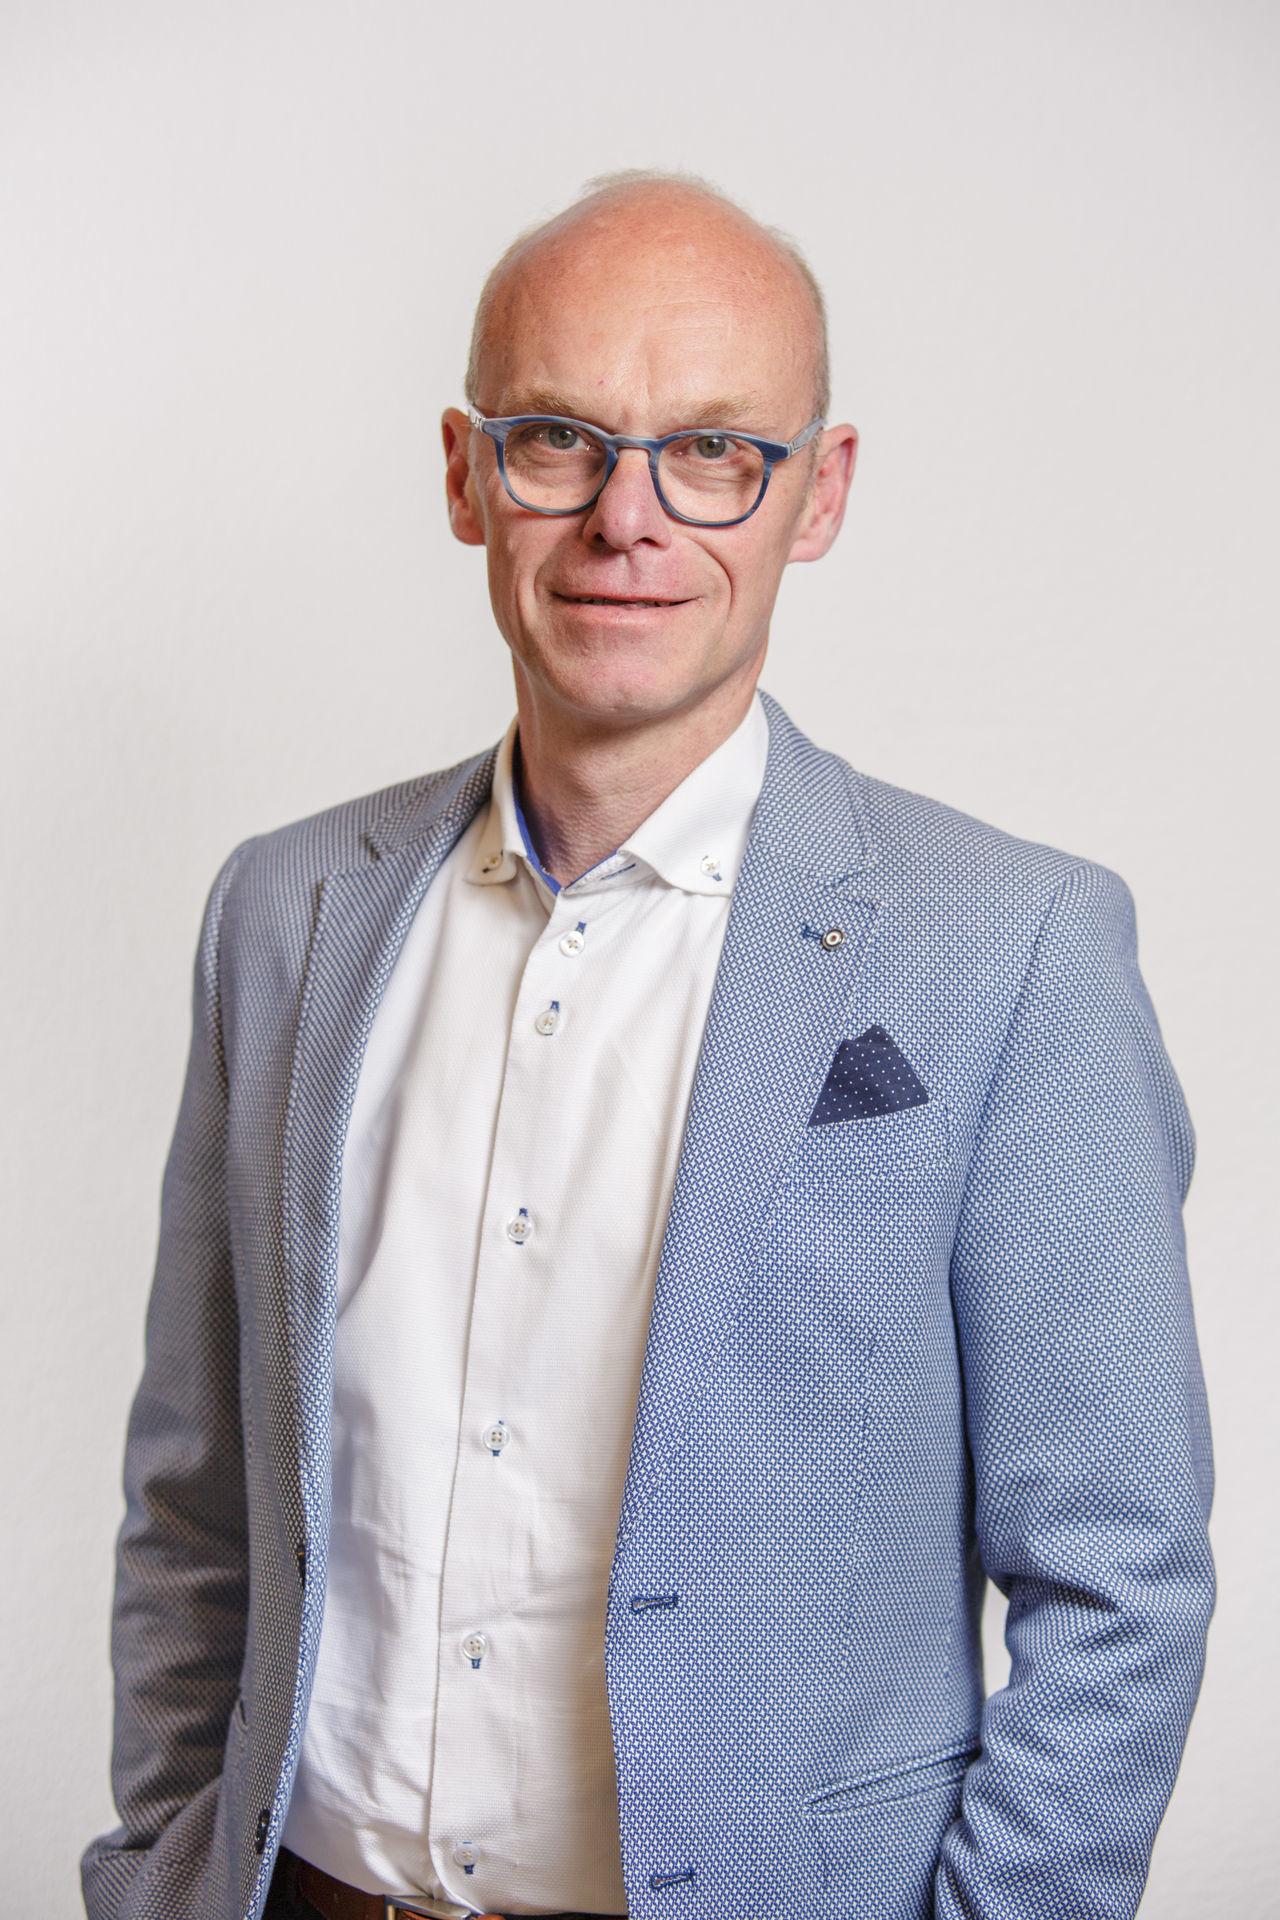 Maurits Dekker - Kwaliteitsadviseur in de zorg